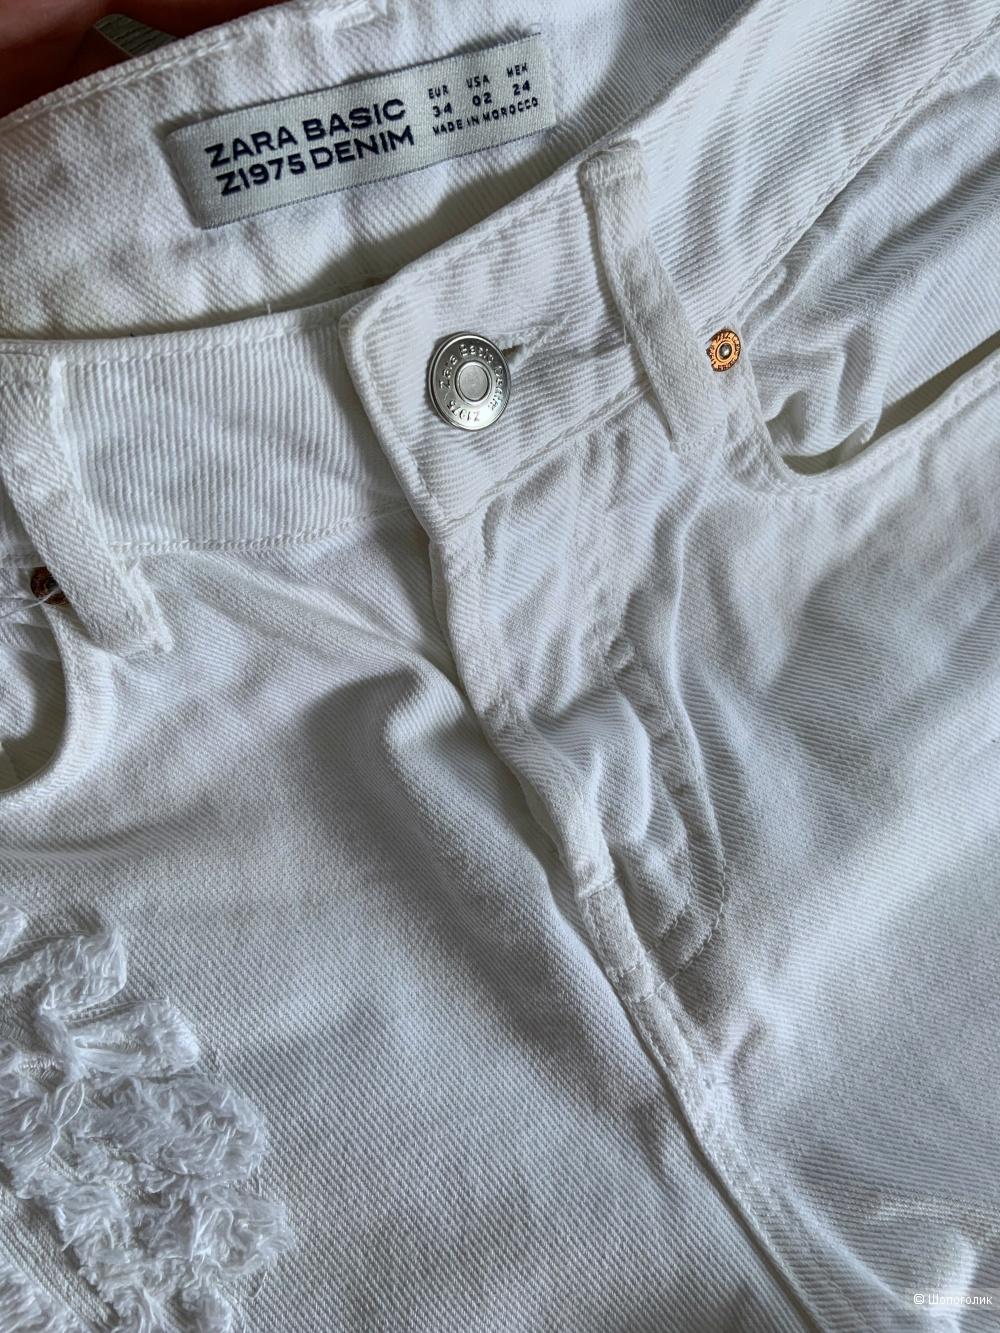 Джинсы Zara, размер 40-42